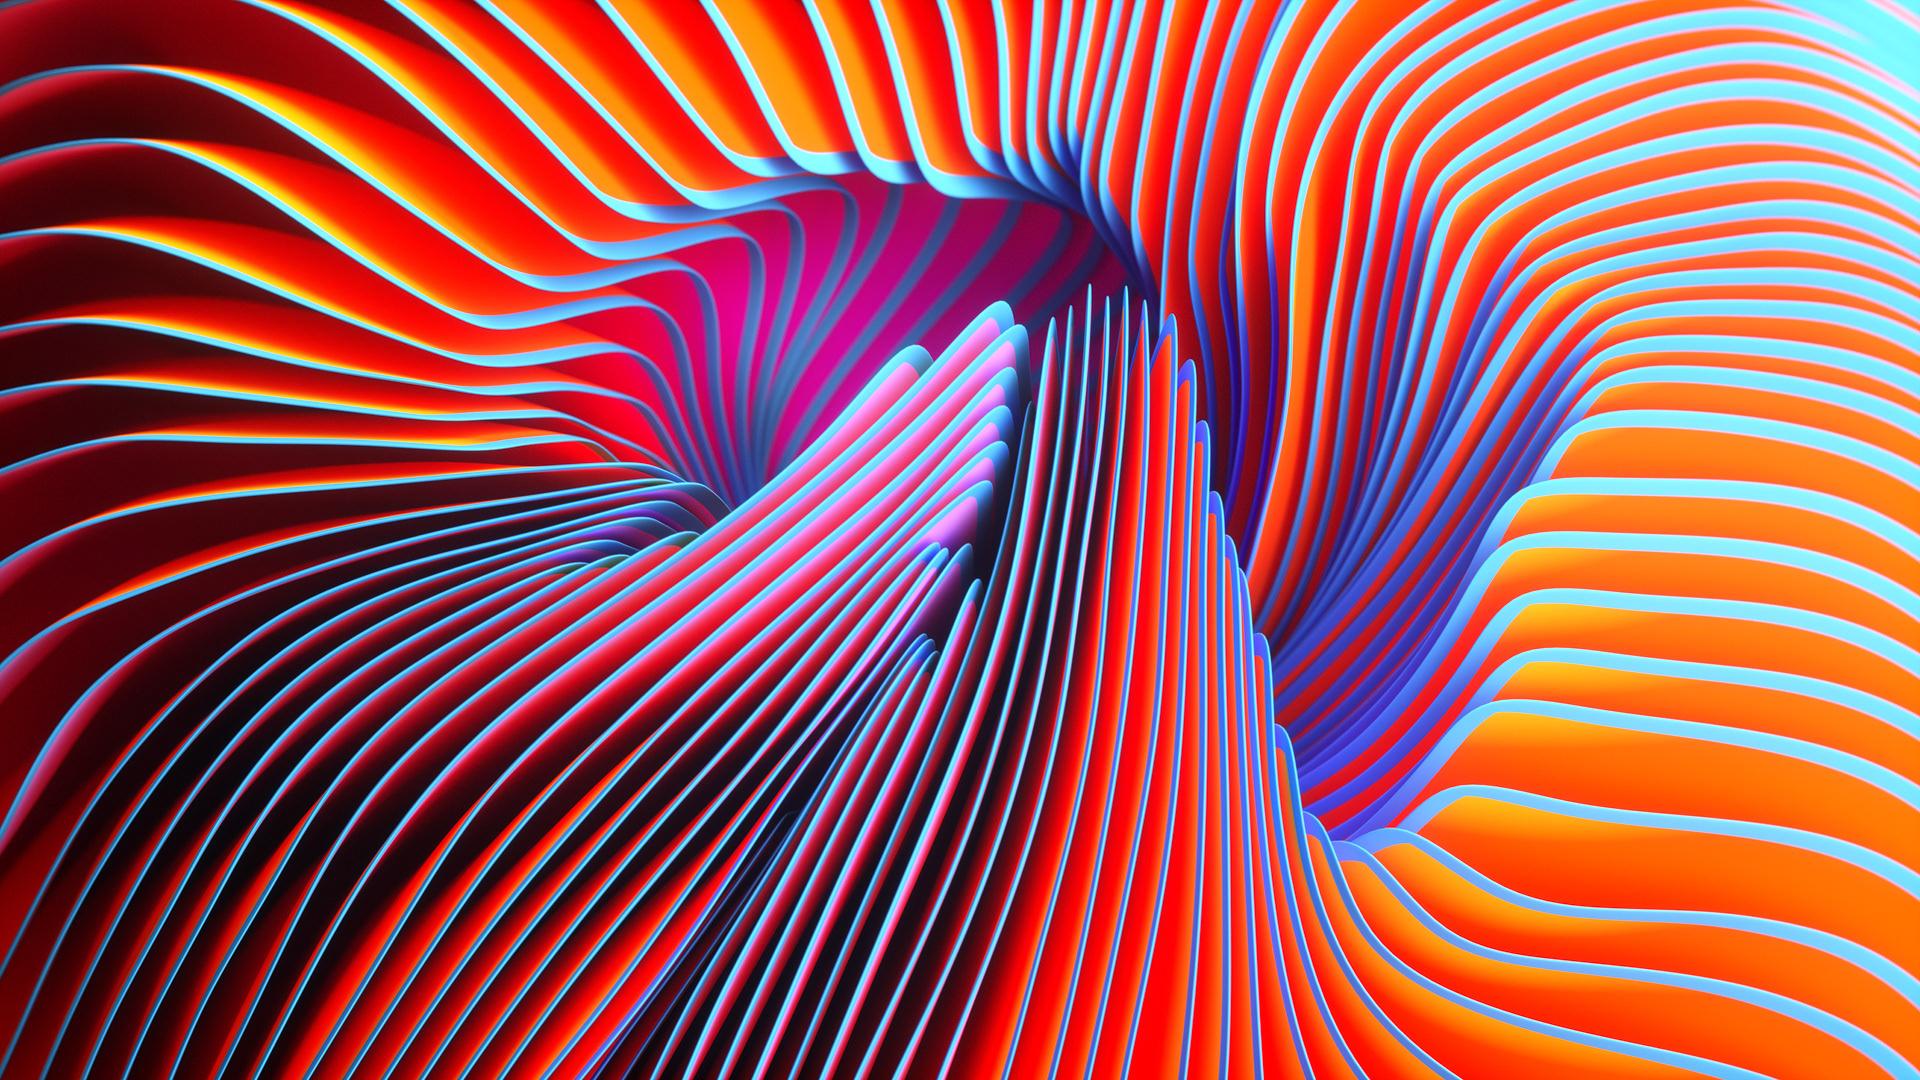 Motion Graphics,Digital Art,Fine Arts